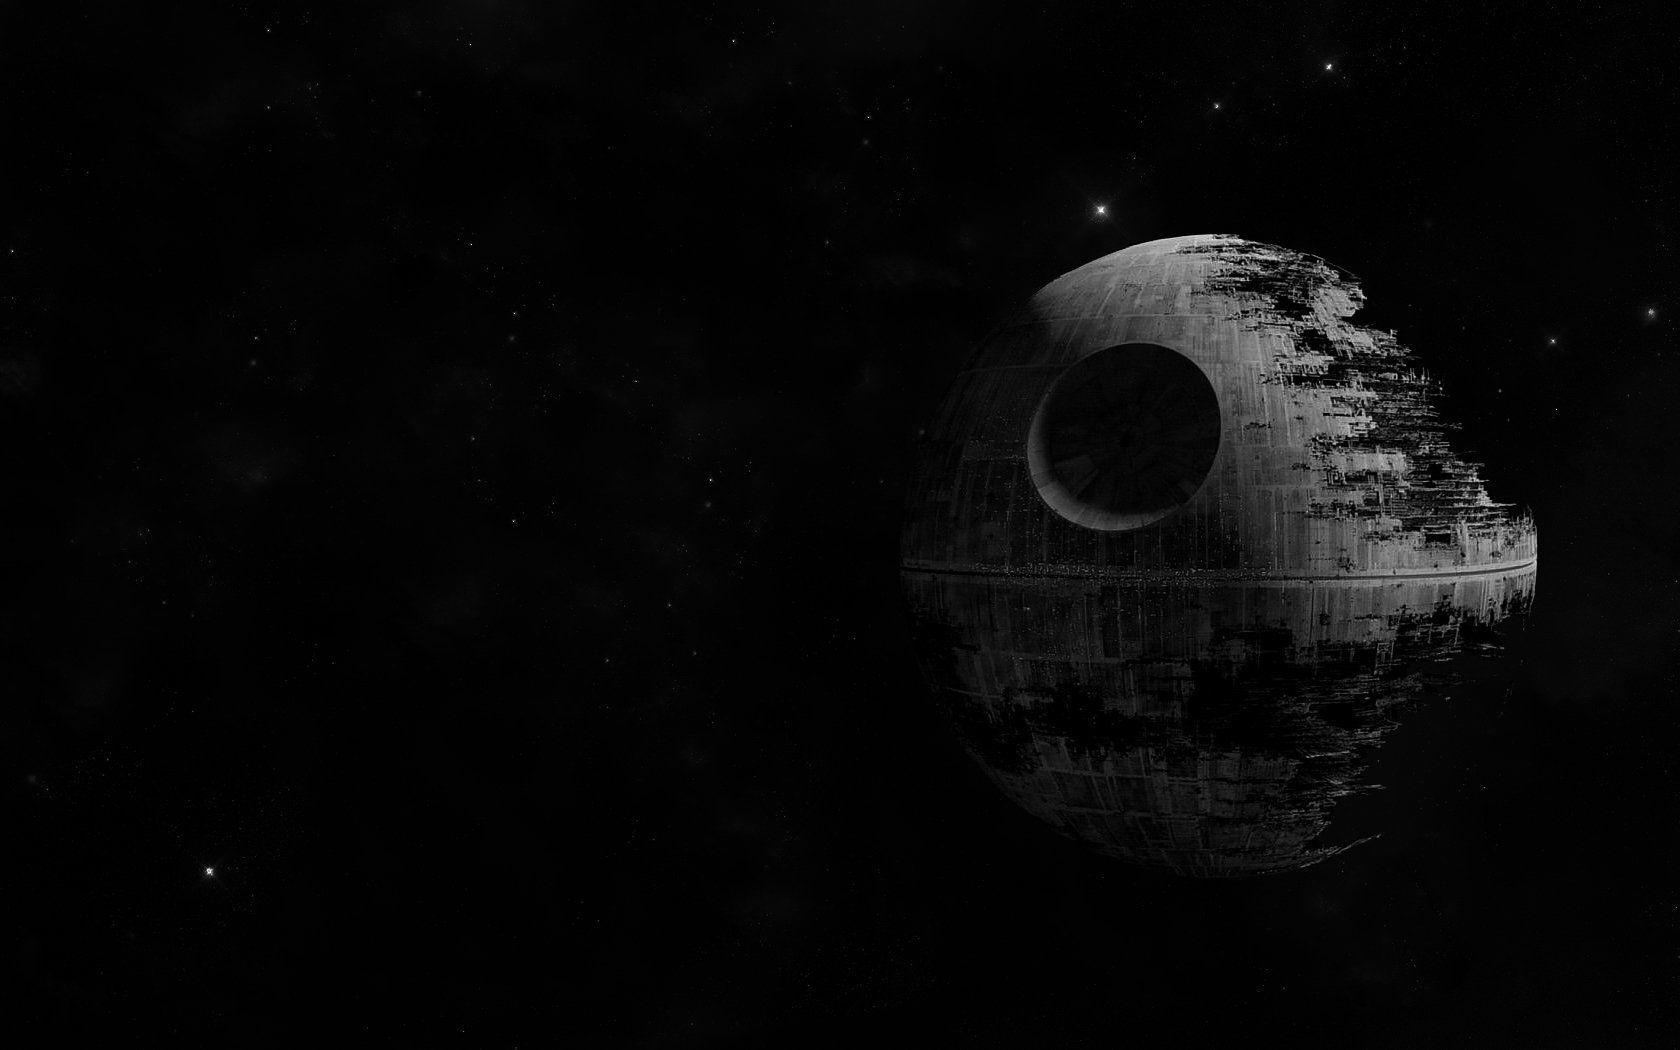 Star Wars Death Star Wallpapers Wallpaper Cave